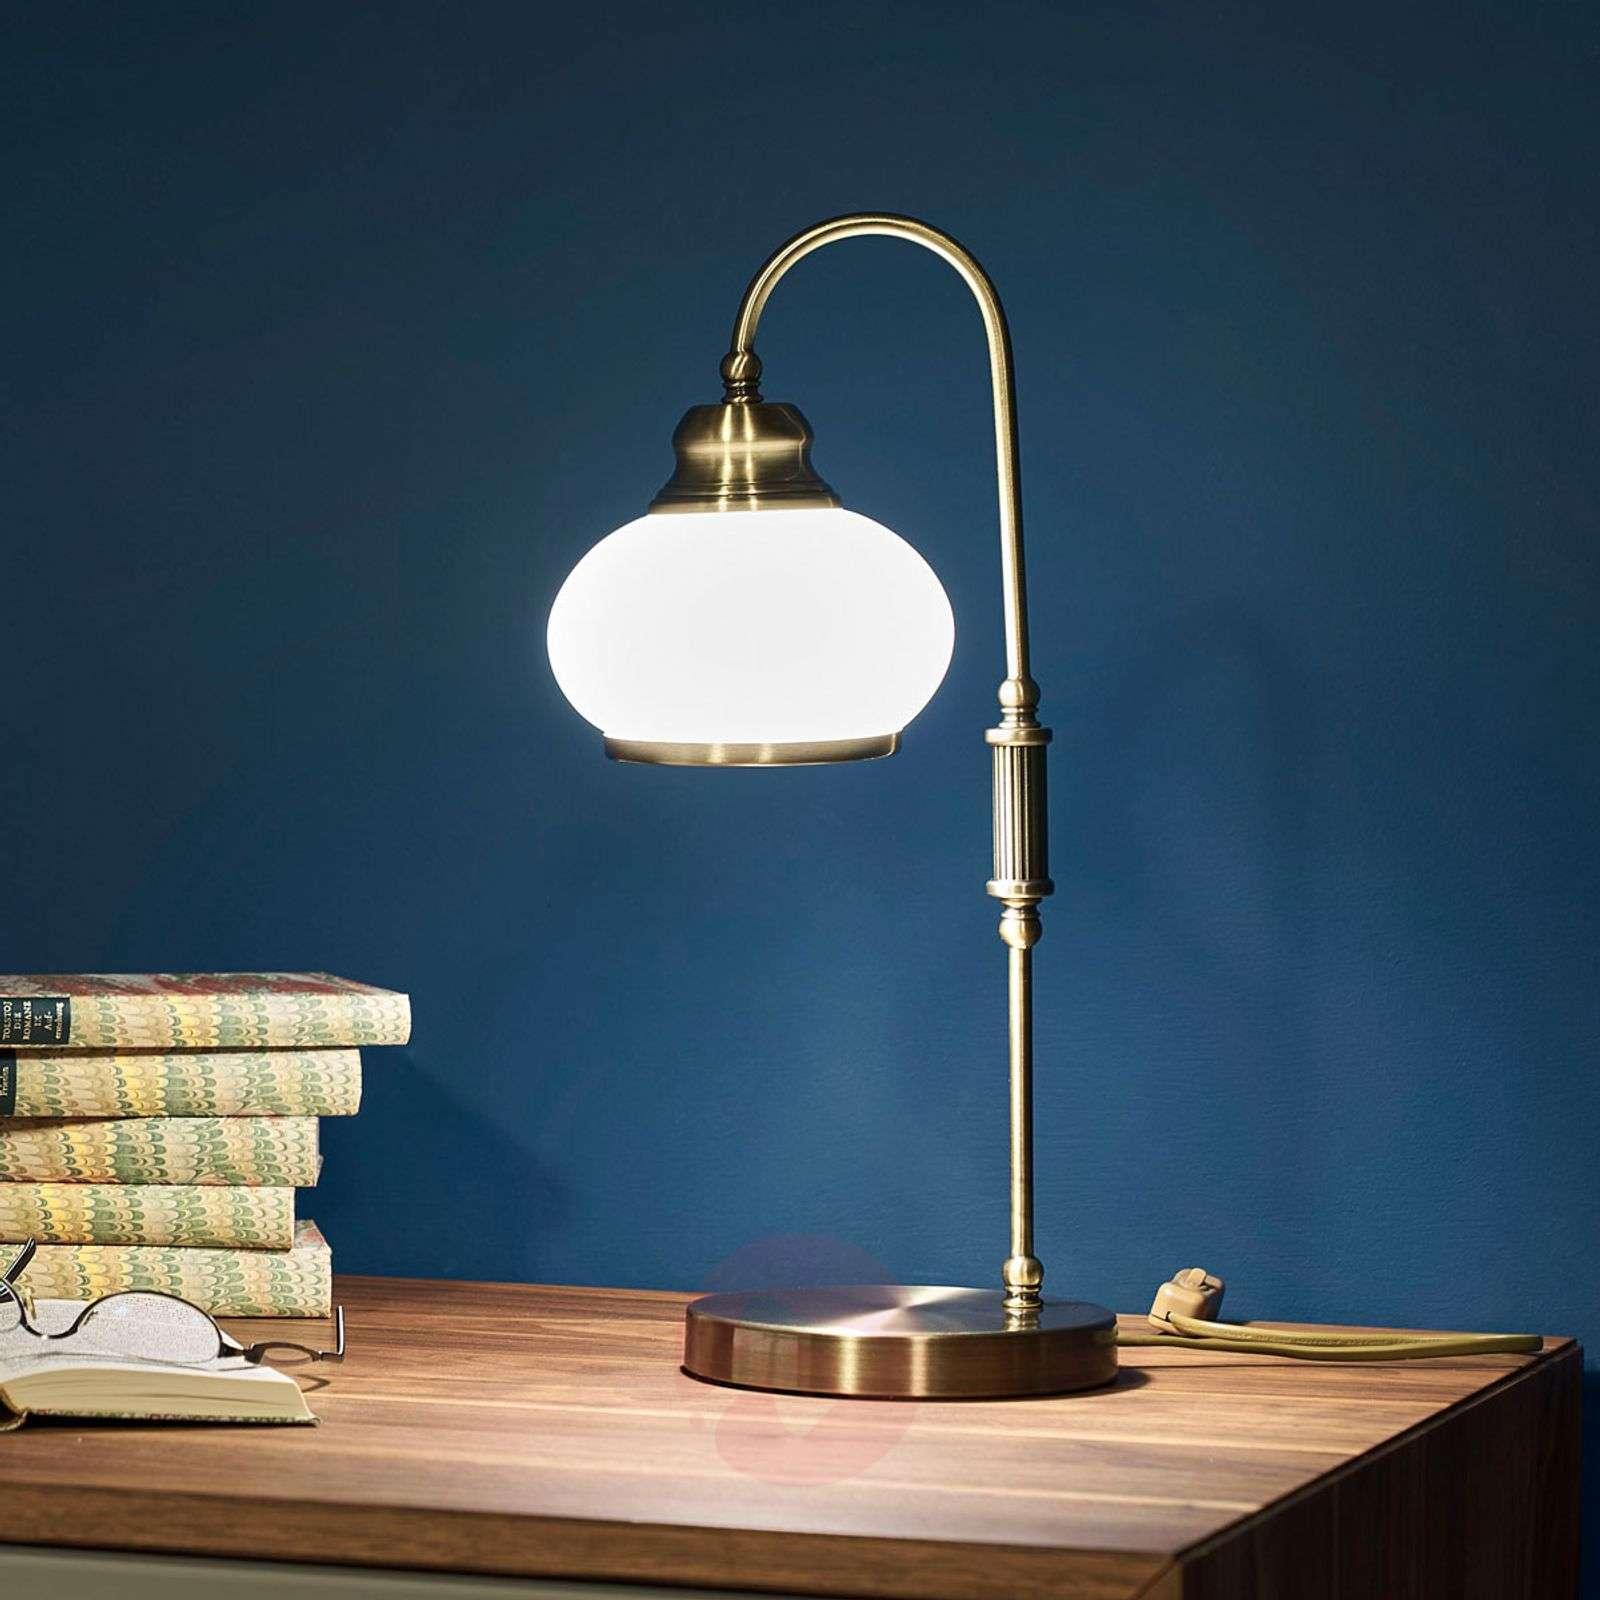 TRUNCATUS Antique Brass Table Lamp-4014358-01